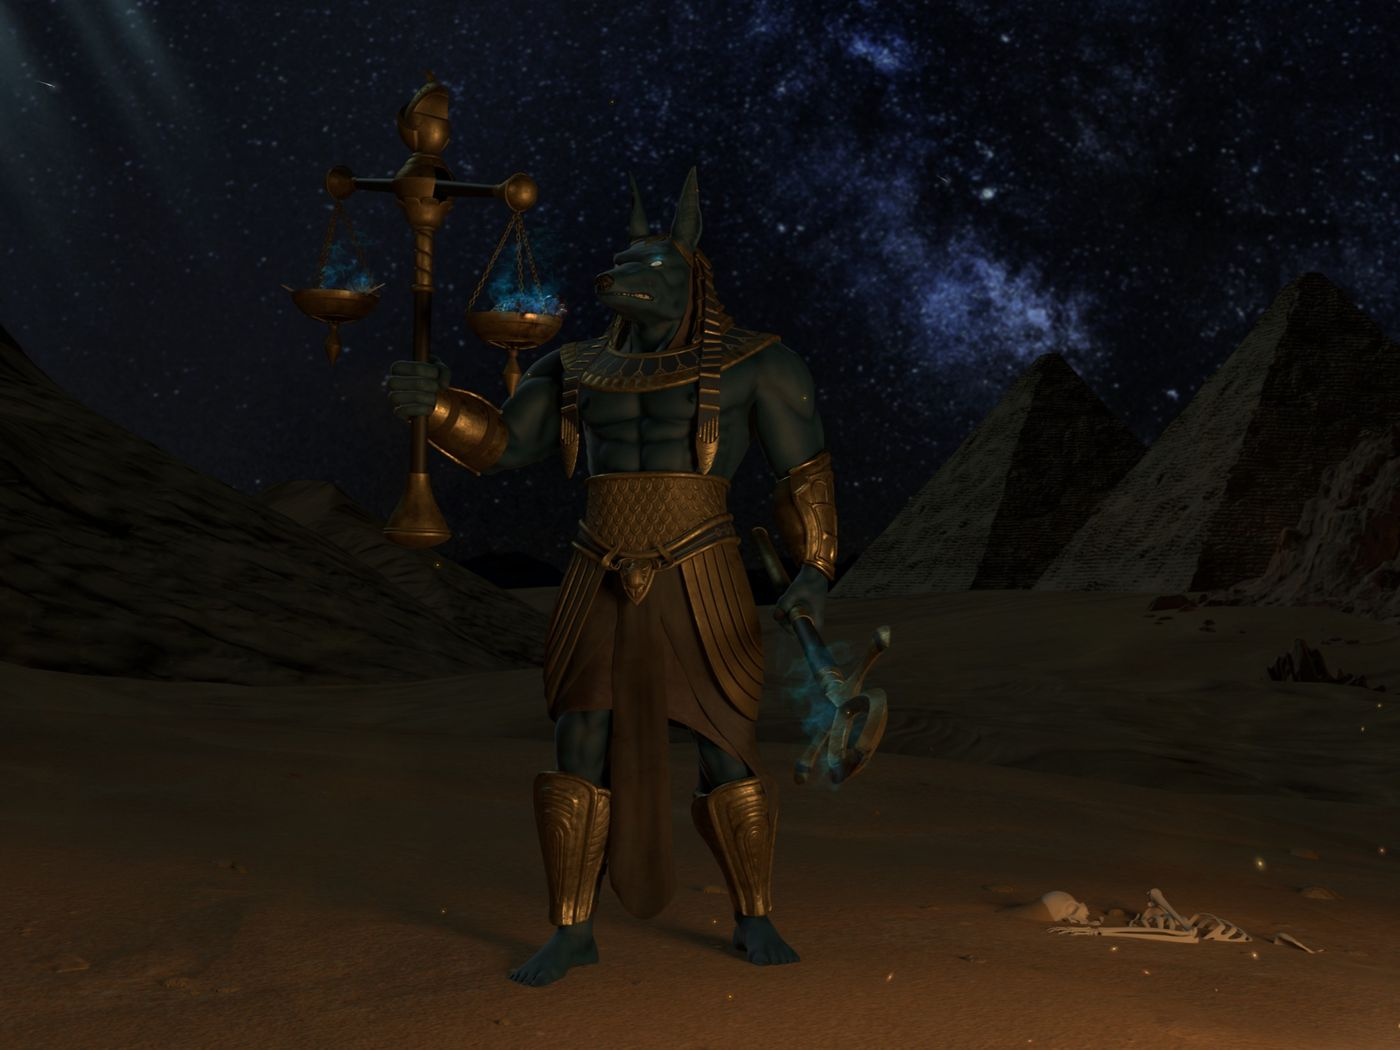 Anubis - God of Death